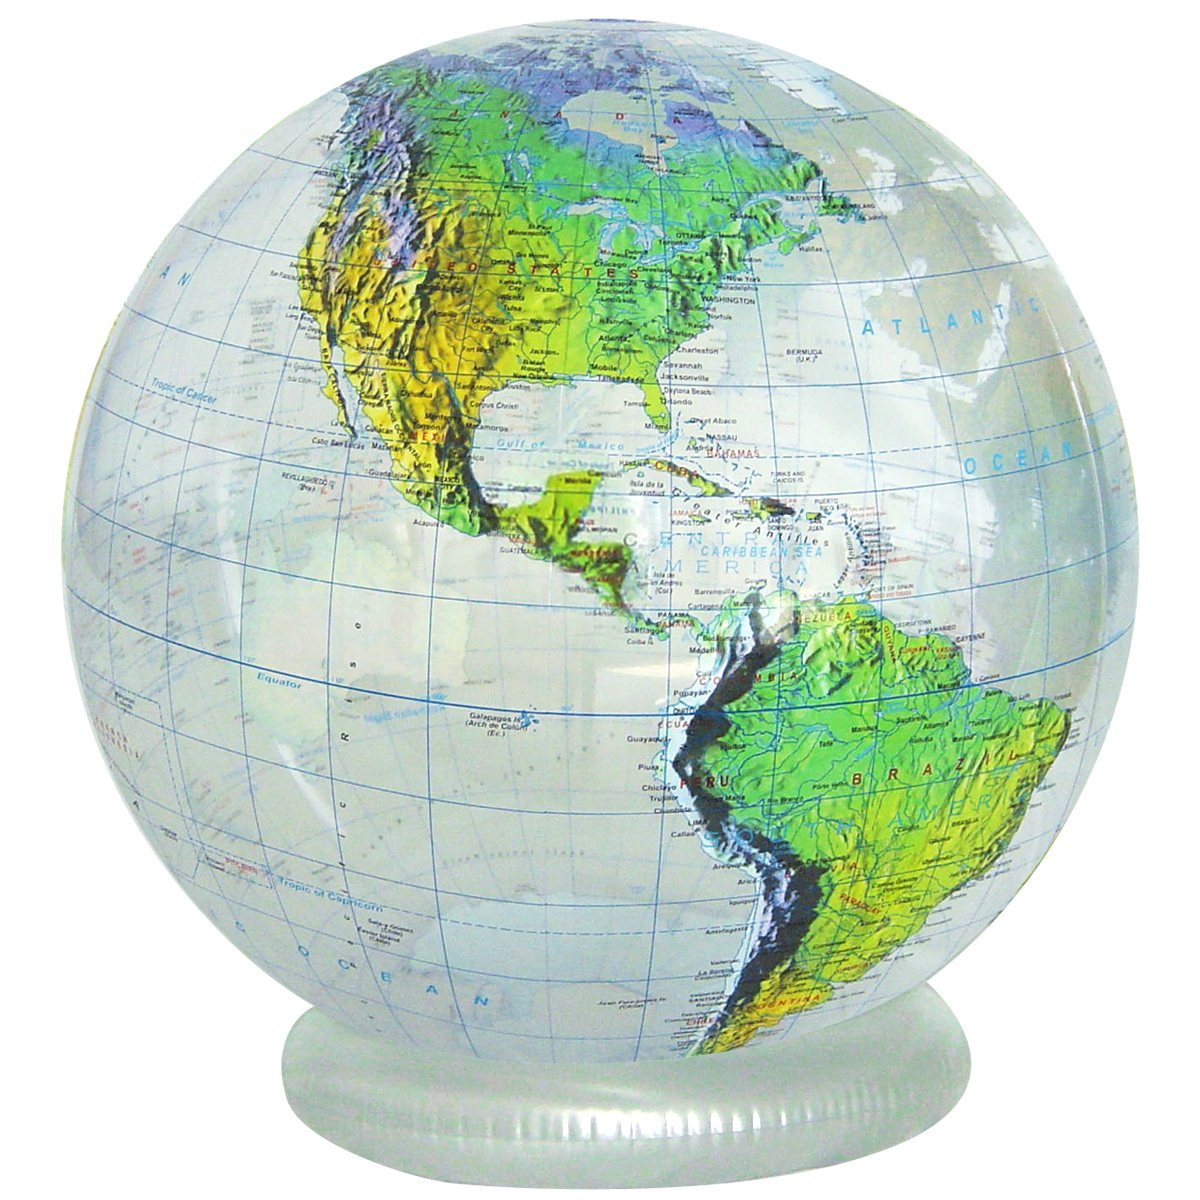 Jet creations 36 inflatable globe clear topographic - Globo terraqueo amazon ...